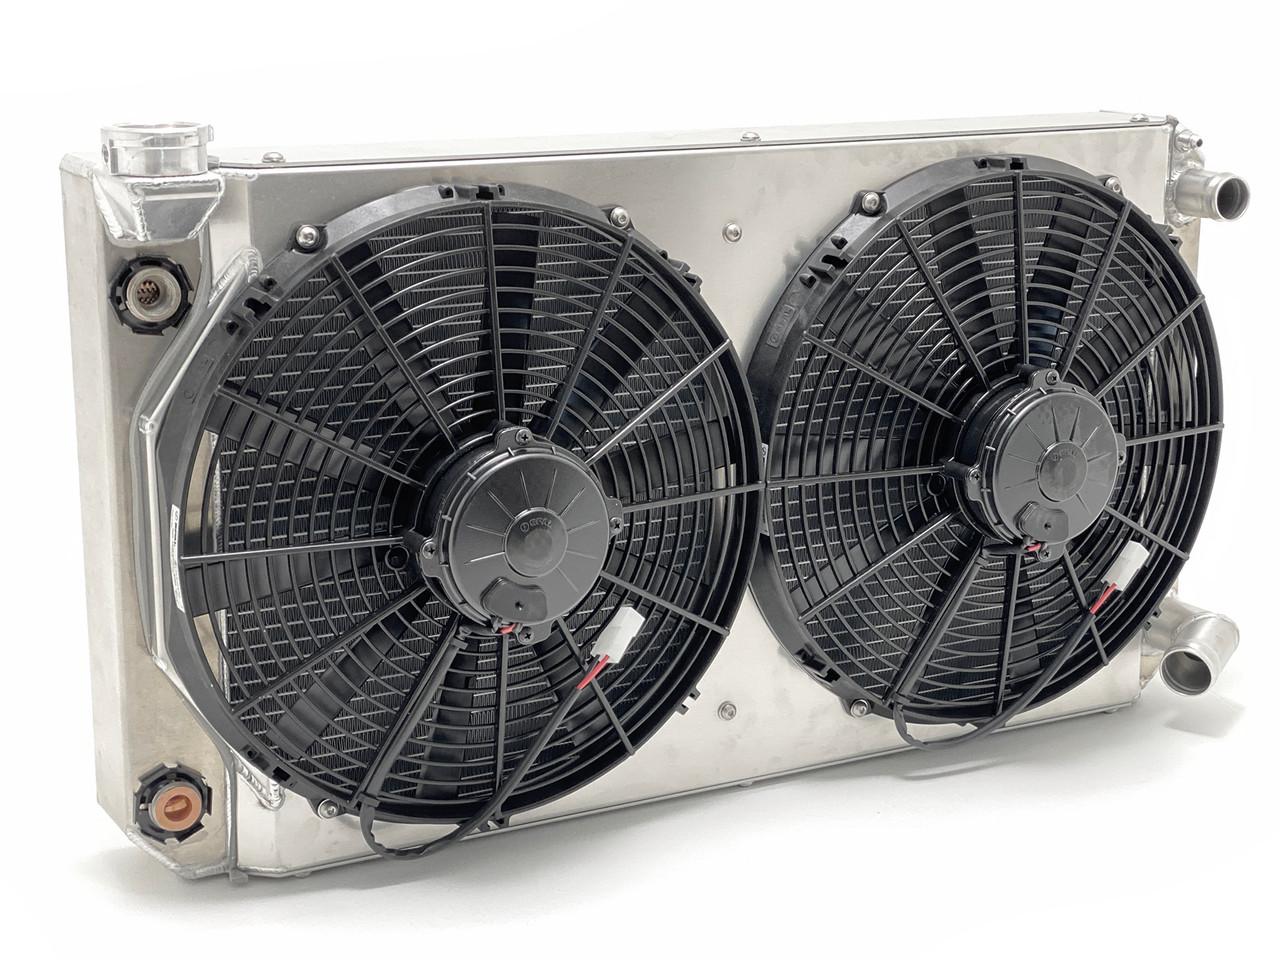 Custom Ron Davis radiator for LS V8 with GenRight Tracer Suspension